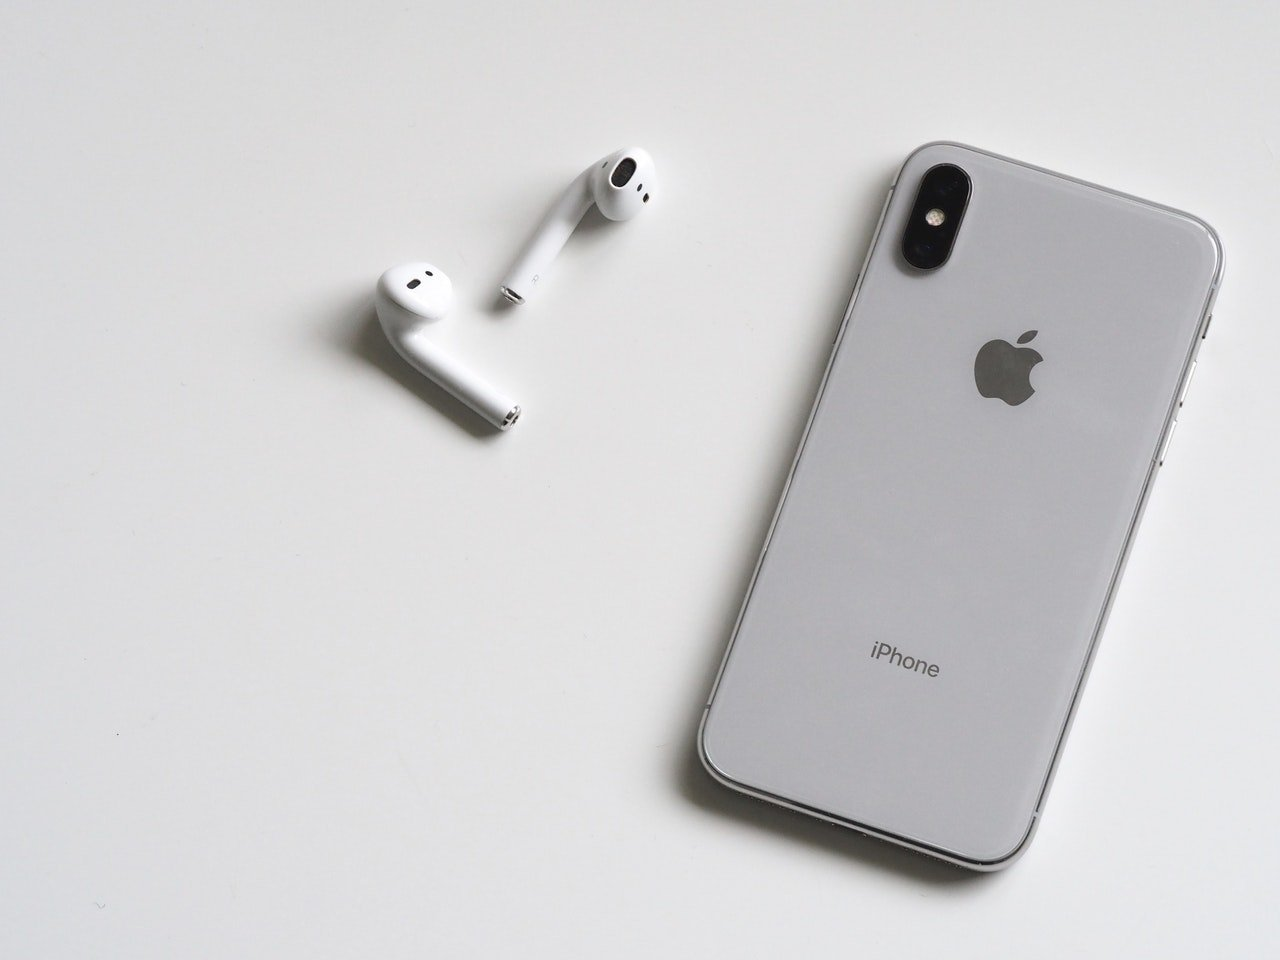 iPhone mit Bluetooth-Kopfhörern